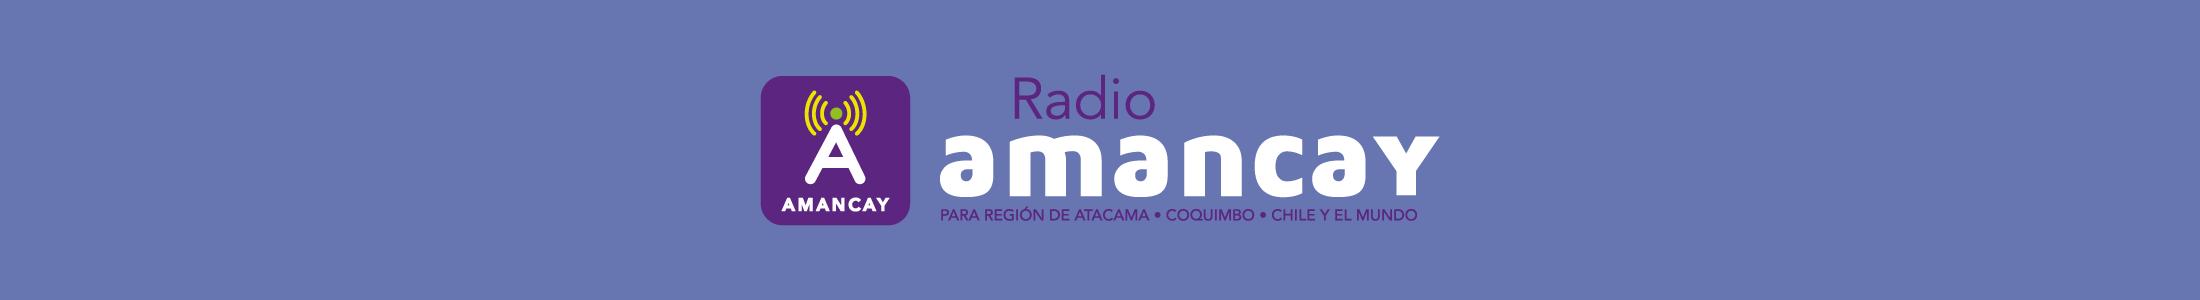 Radio Amancay